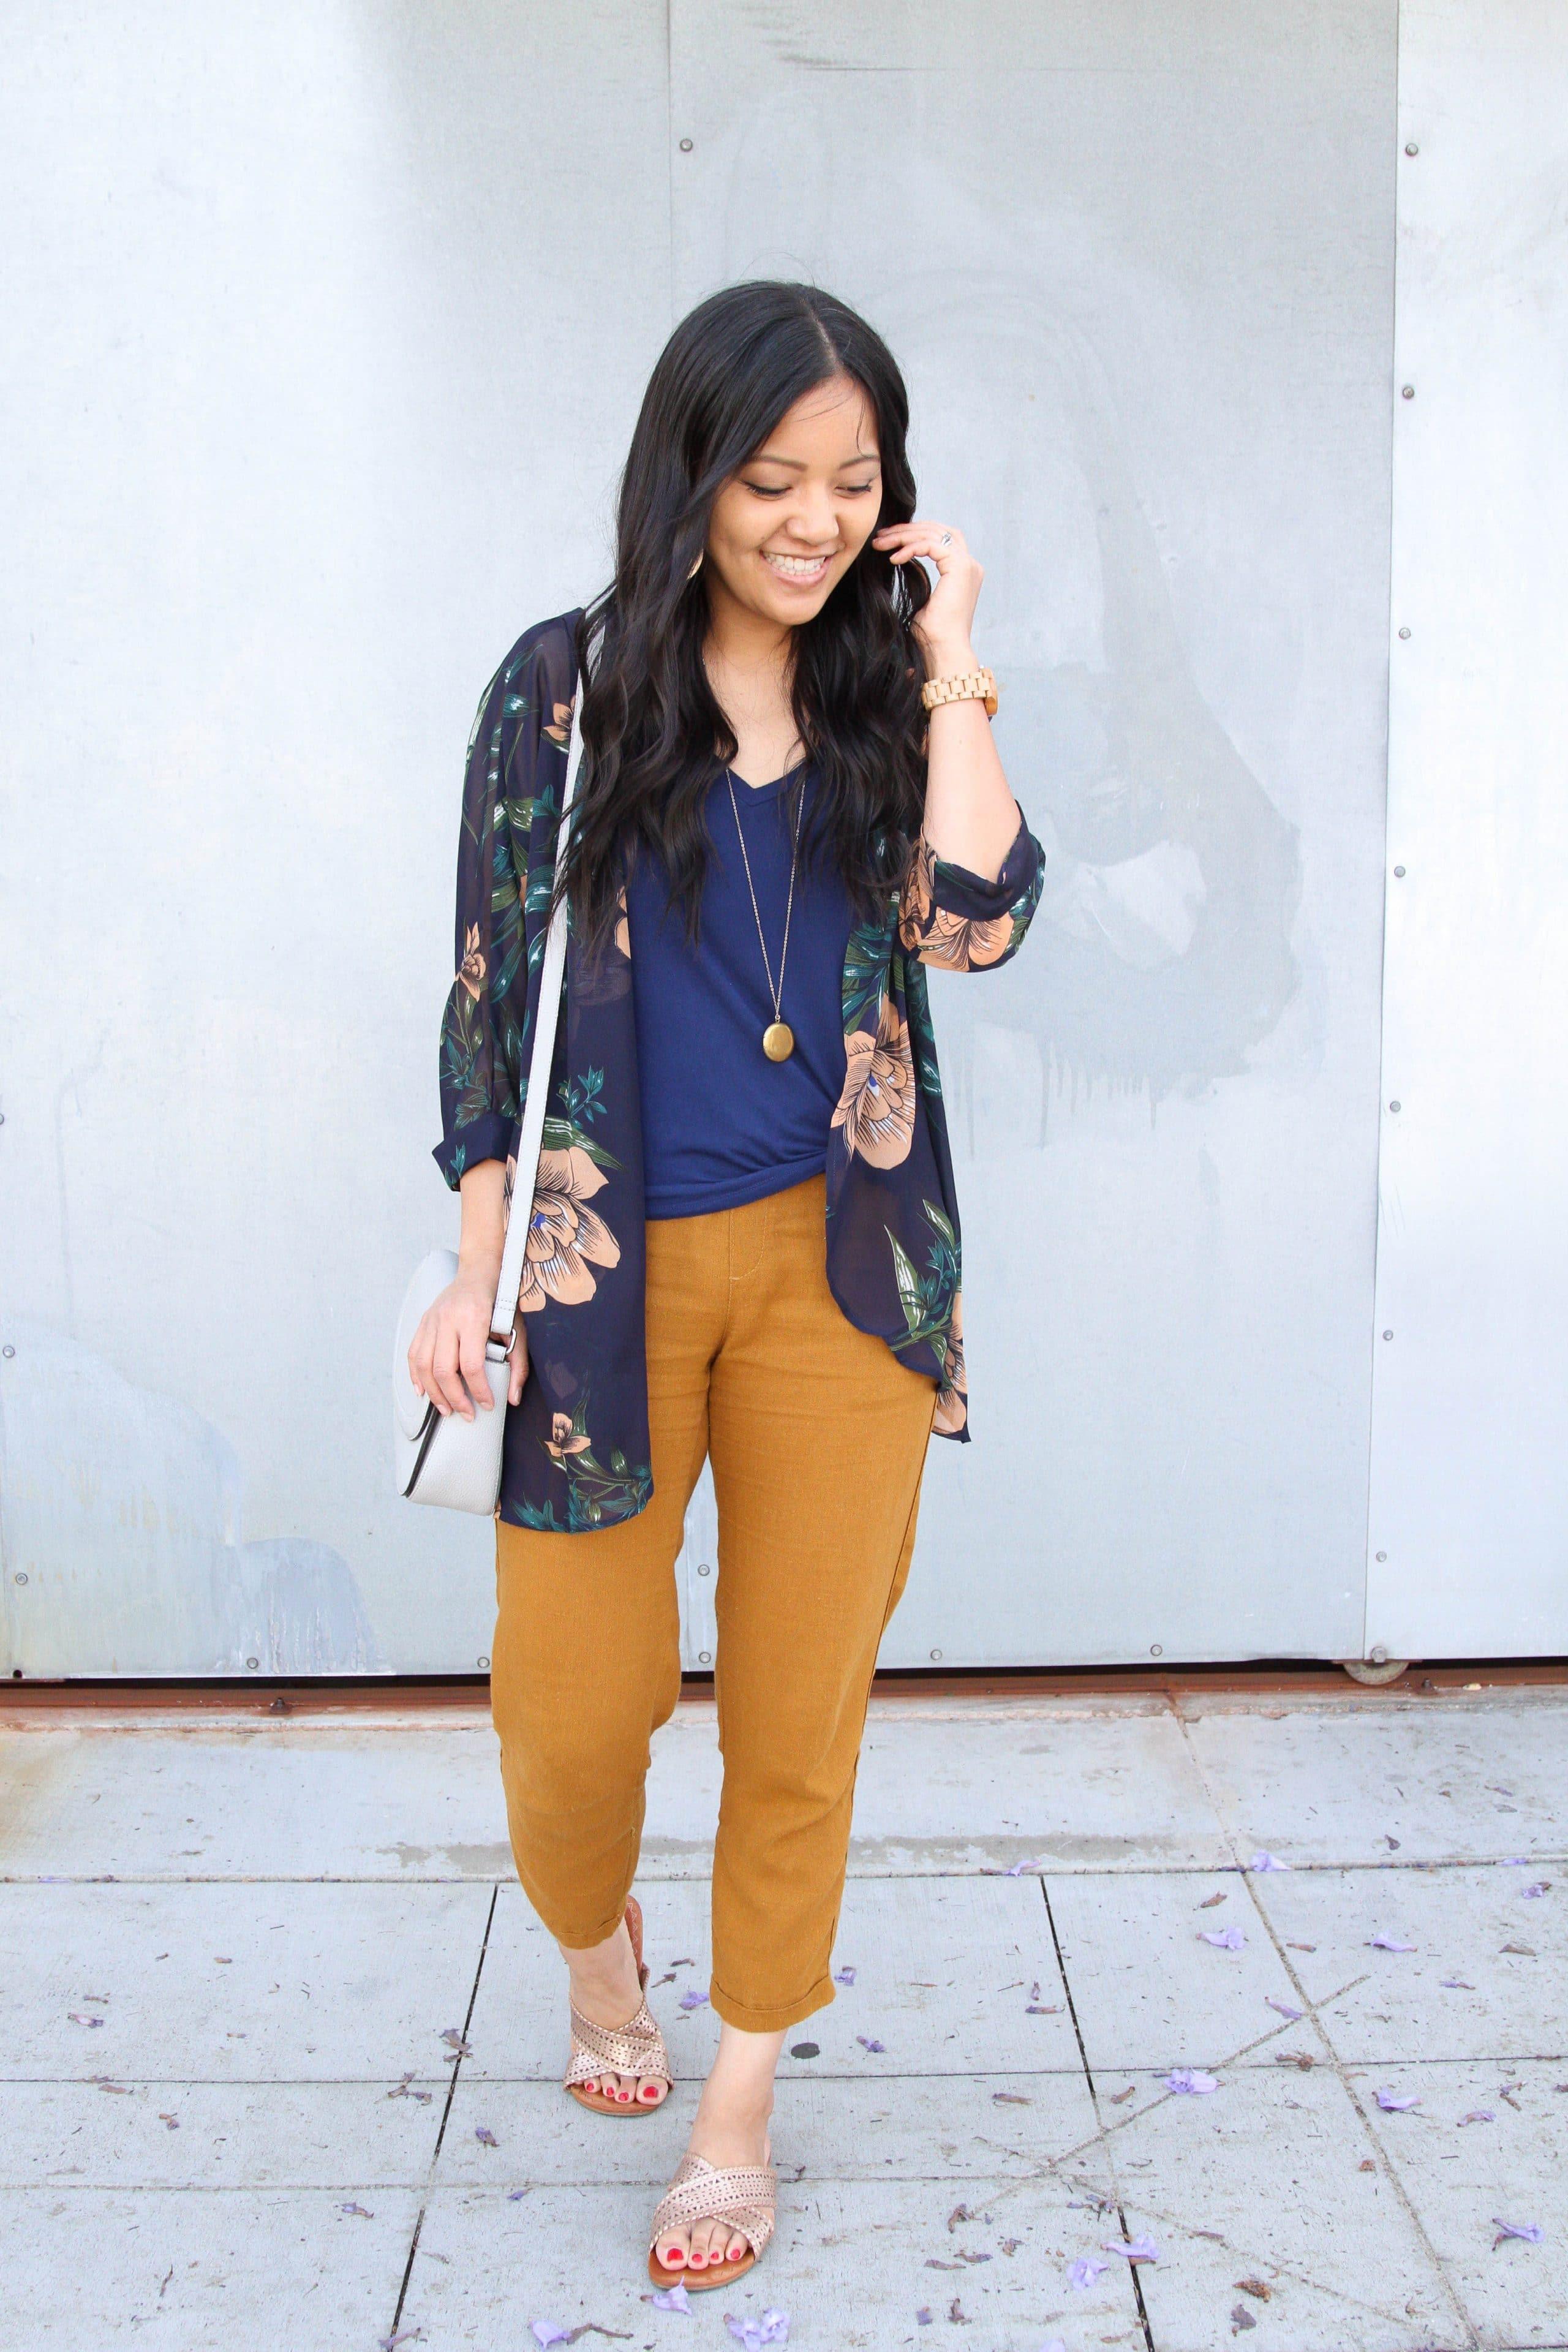 navy top + tan linen pants + floral wrap + metallic sandals